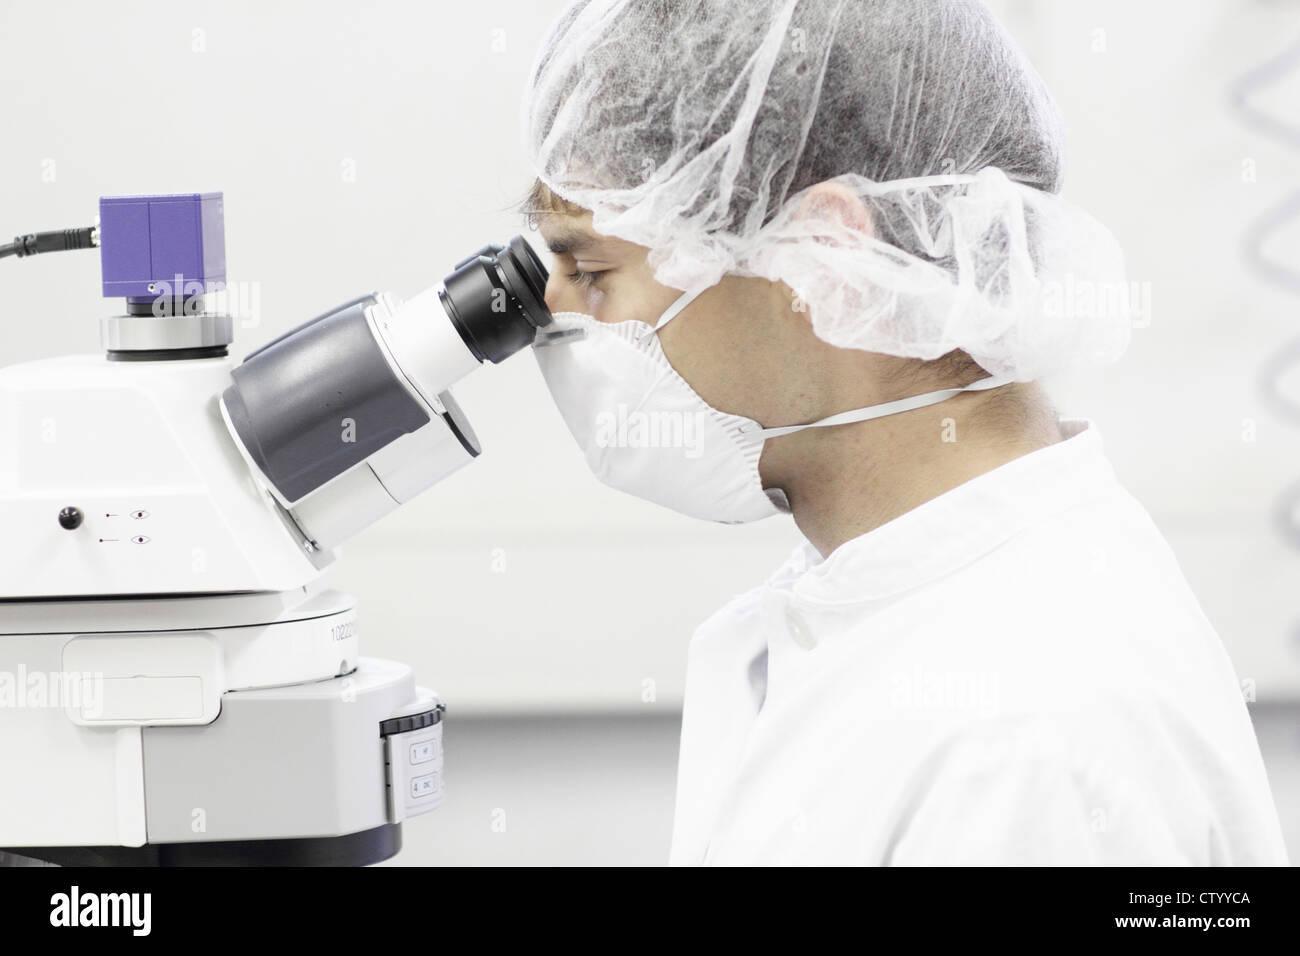 Scientist using microscope in lab - Stock Image